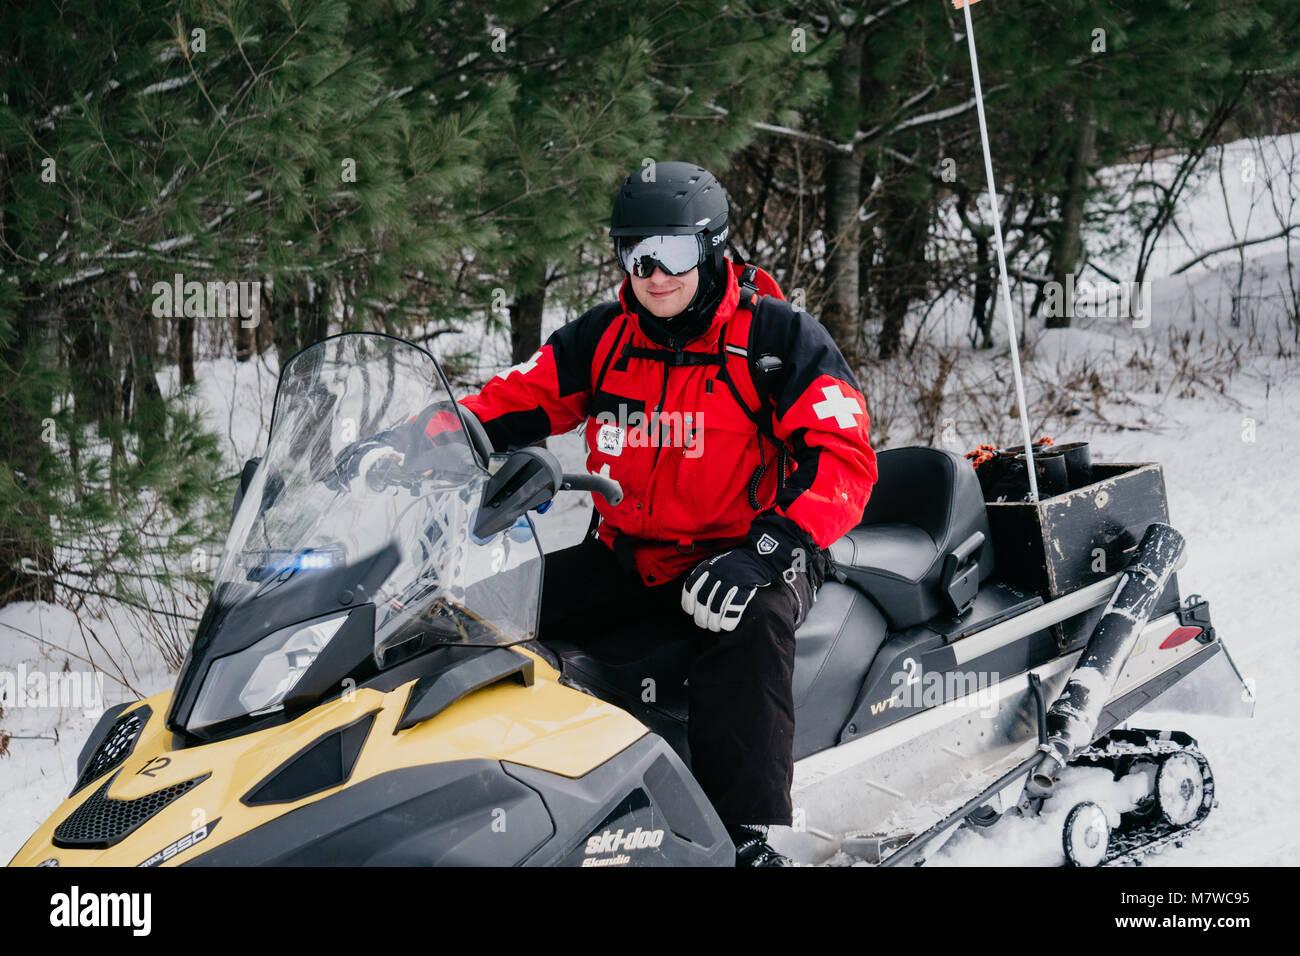 Ski Patroller on snowmobile - Stock Image